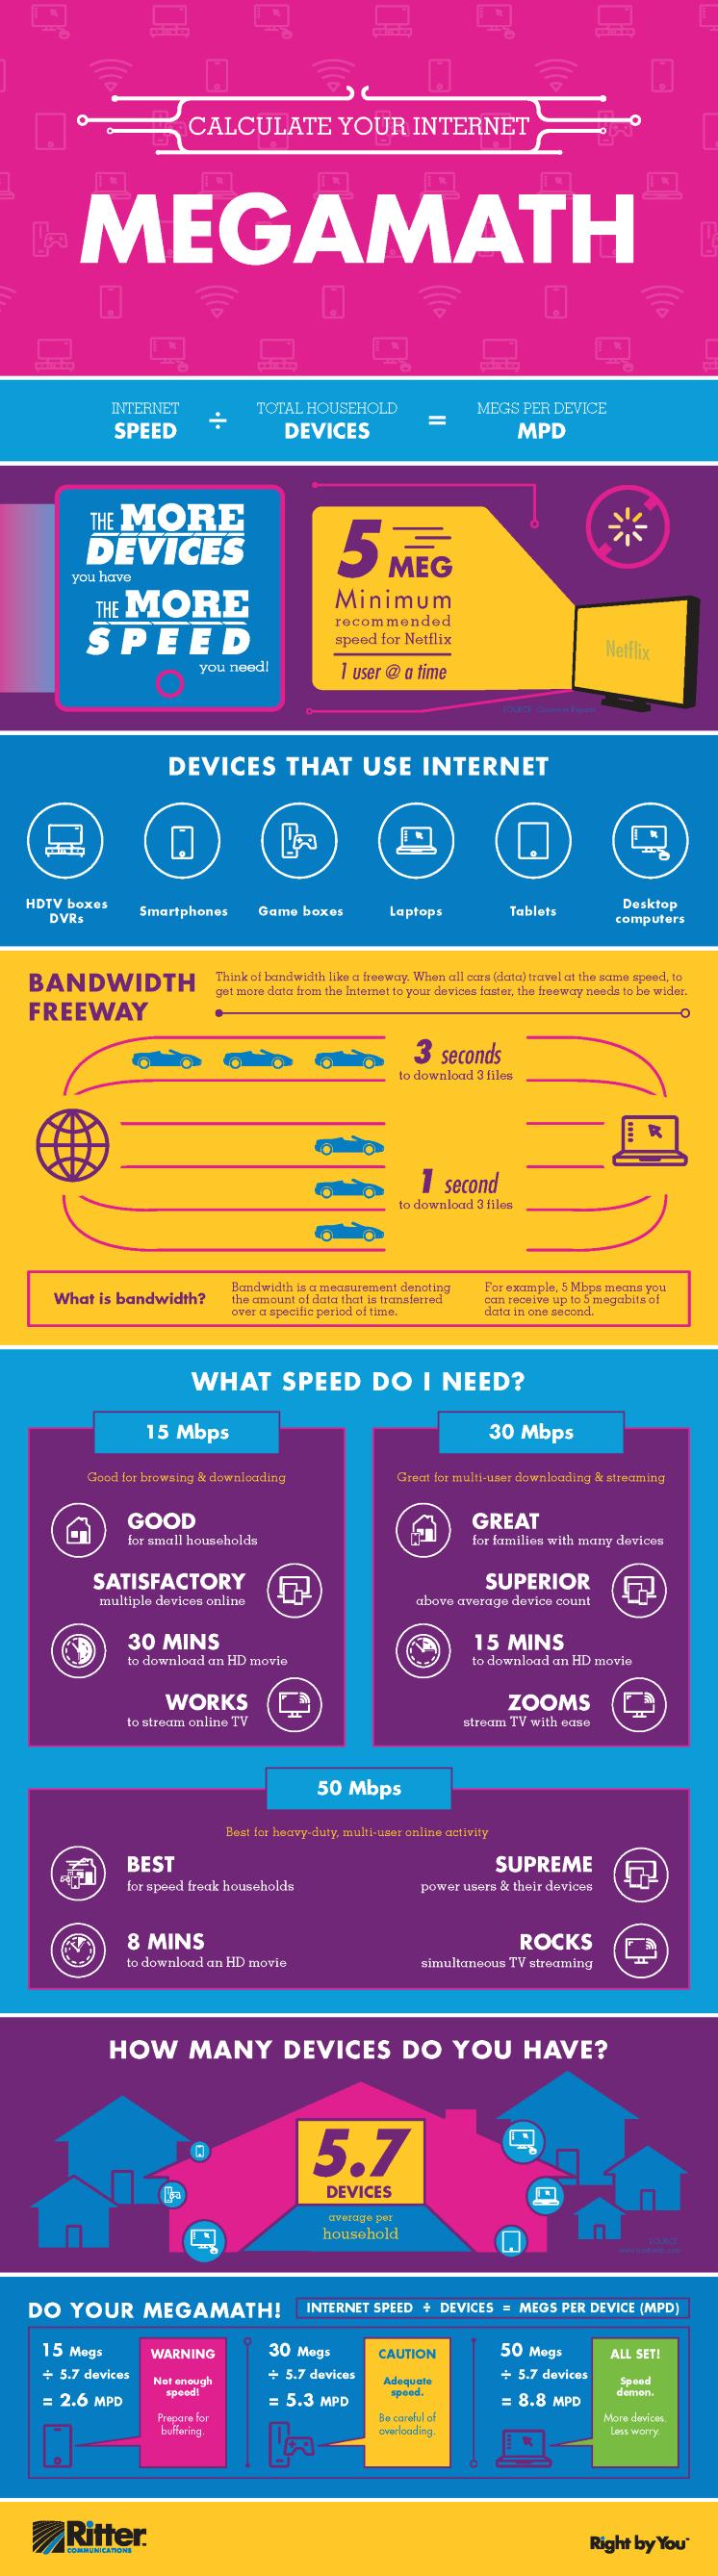 Ritter Communications Infographic MegaRitter Blog